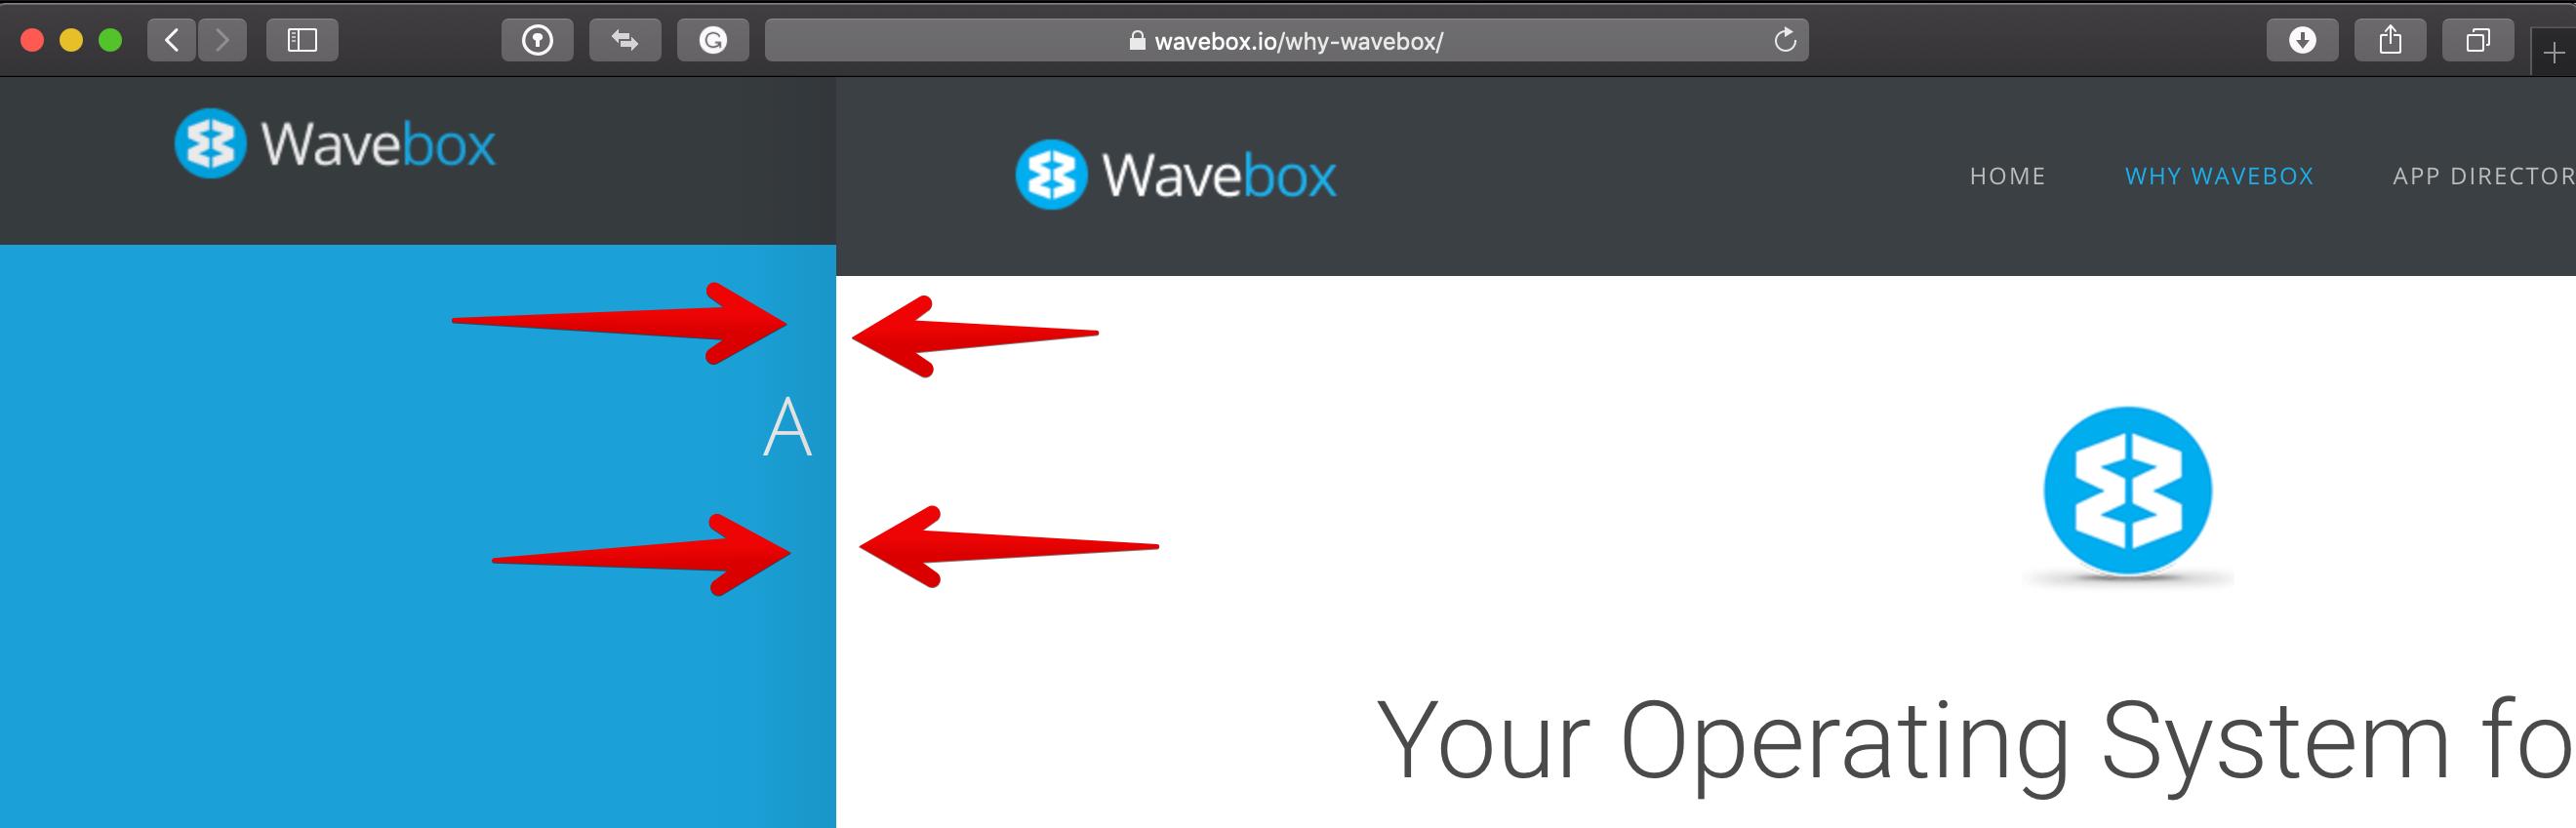 Add feedback animation for two-finger back/forward navigation